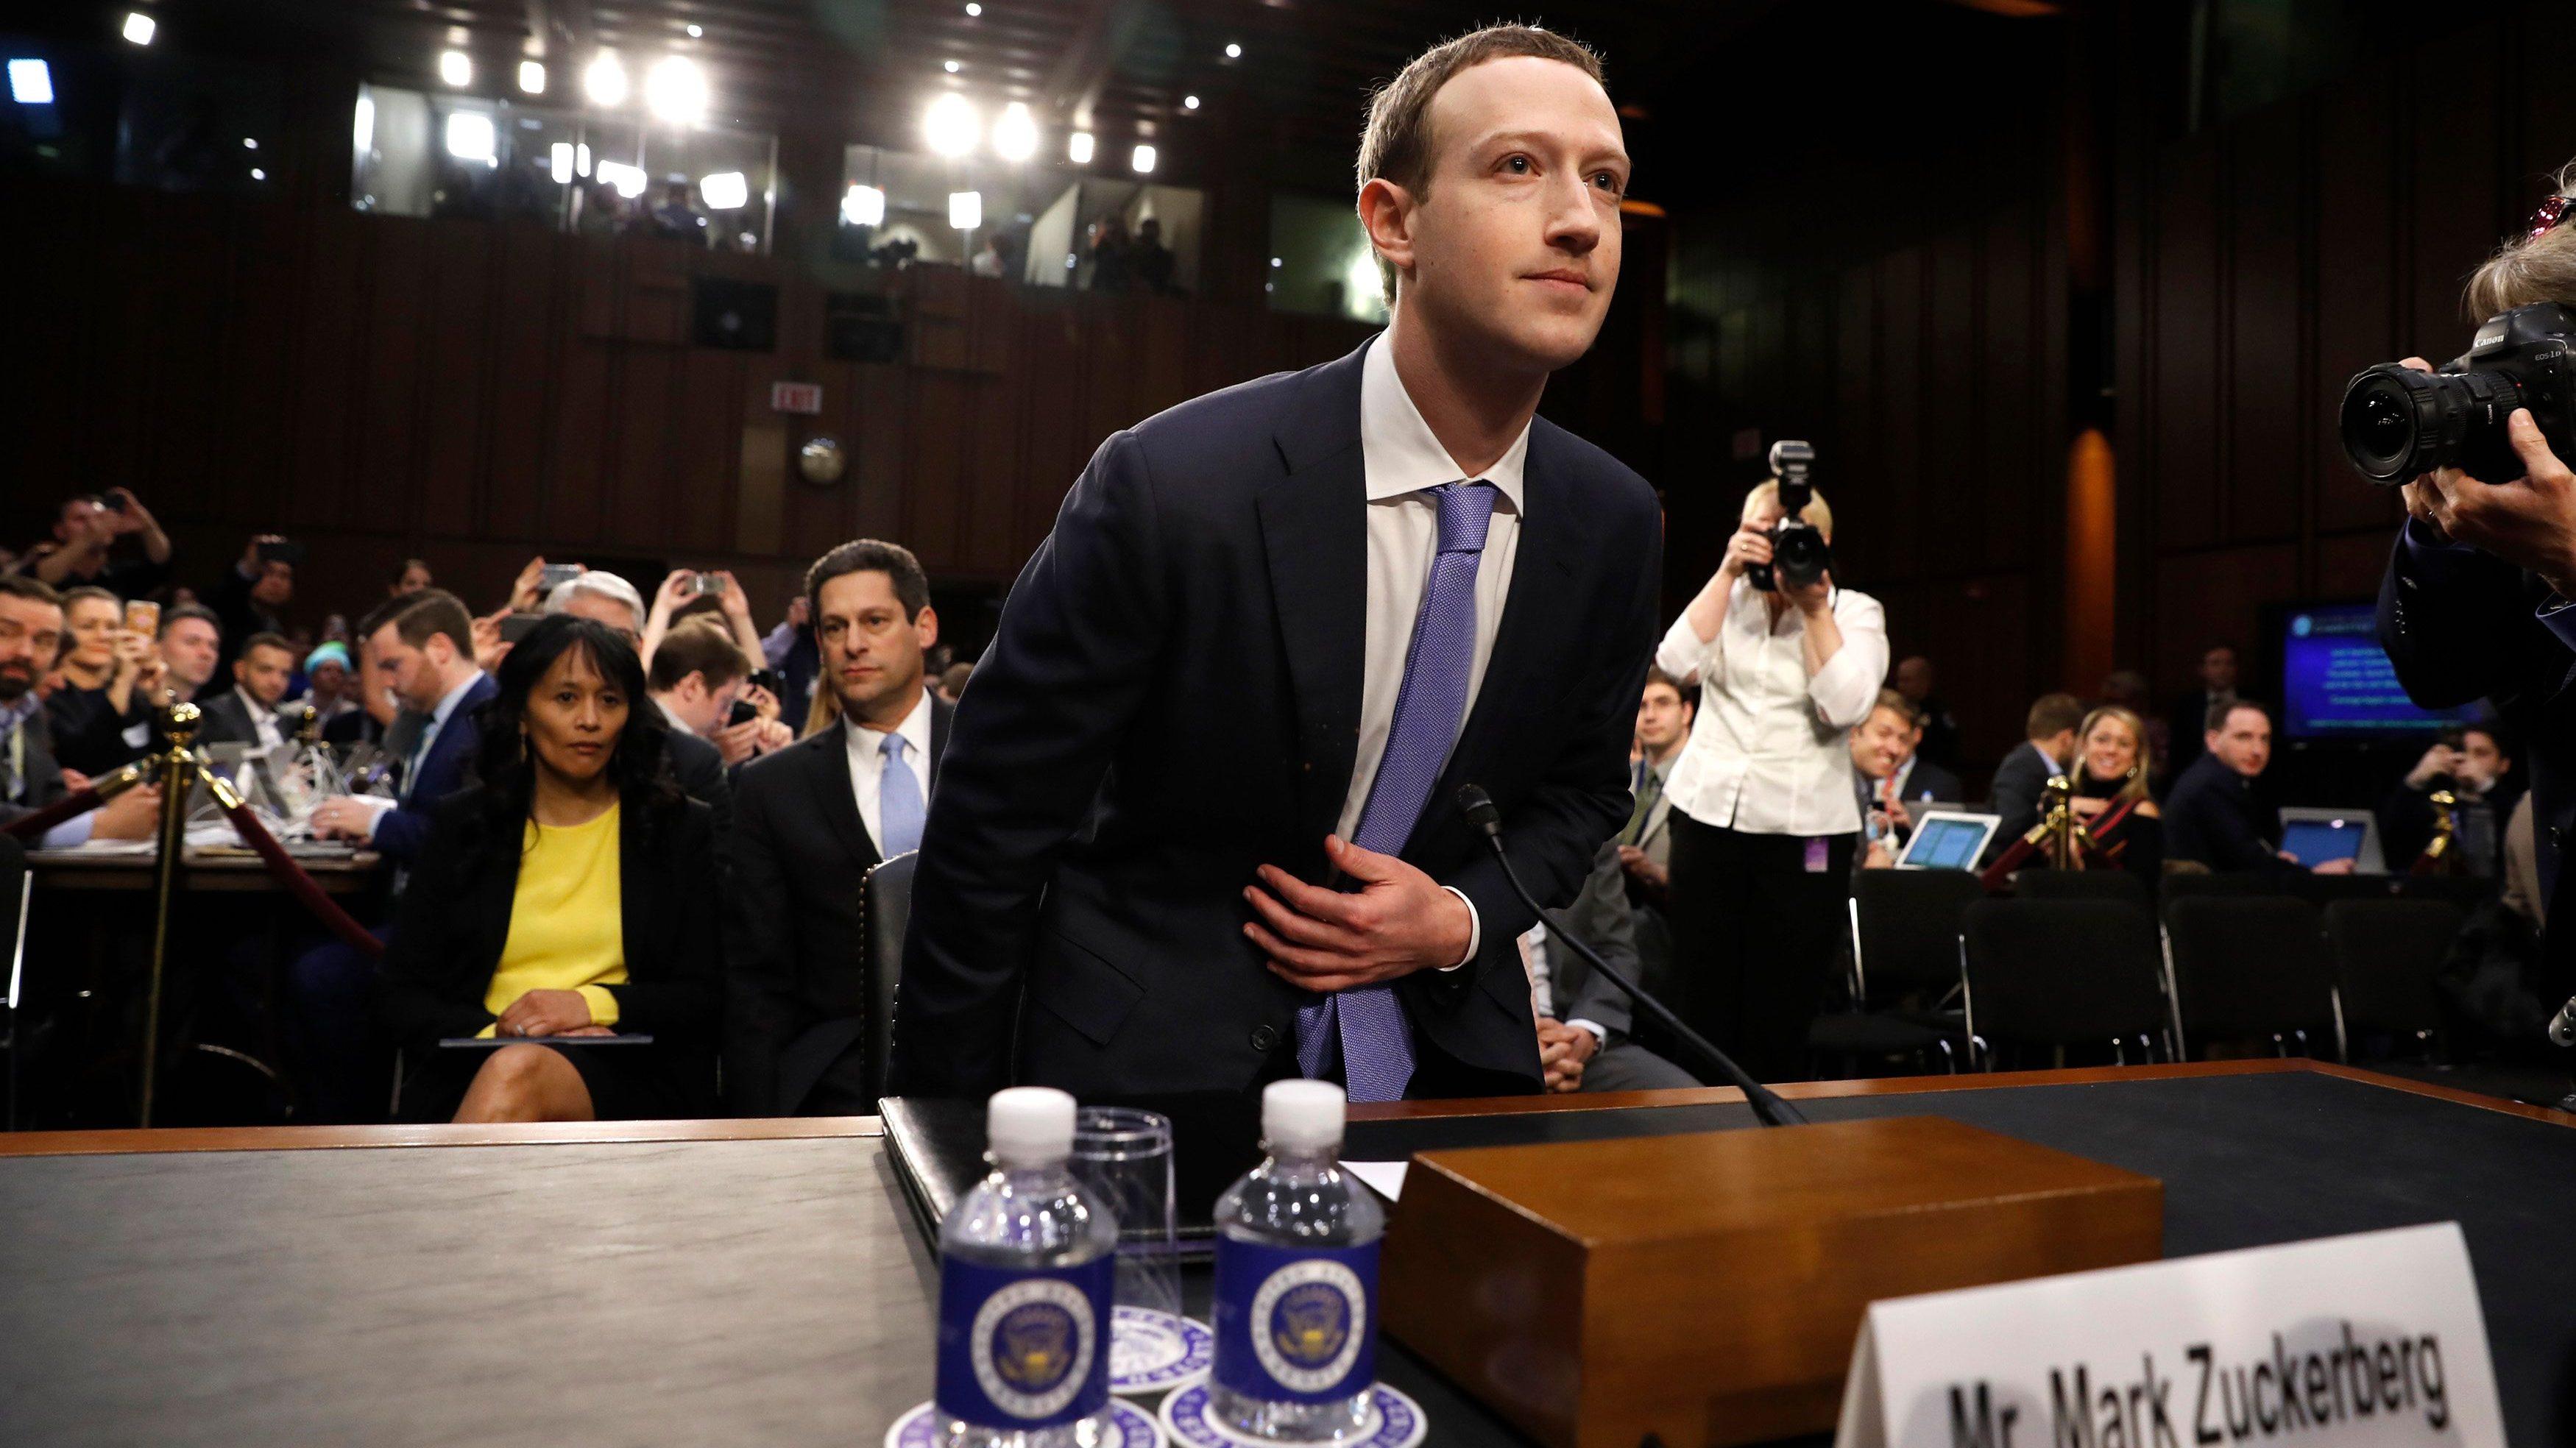 Mark Zuckerberg testimony released ahead of US Congress appearance